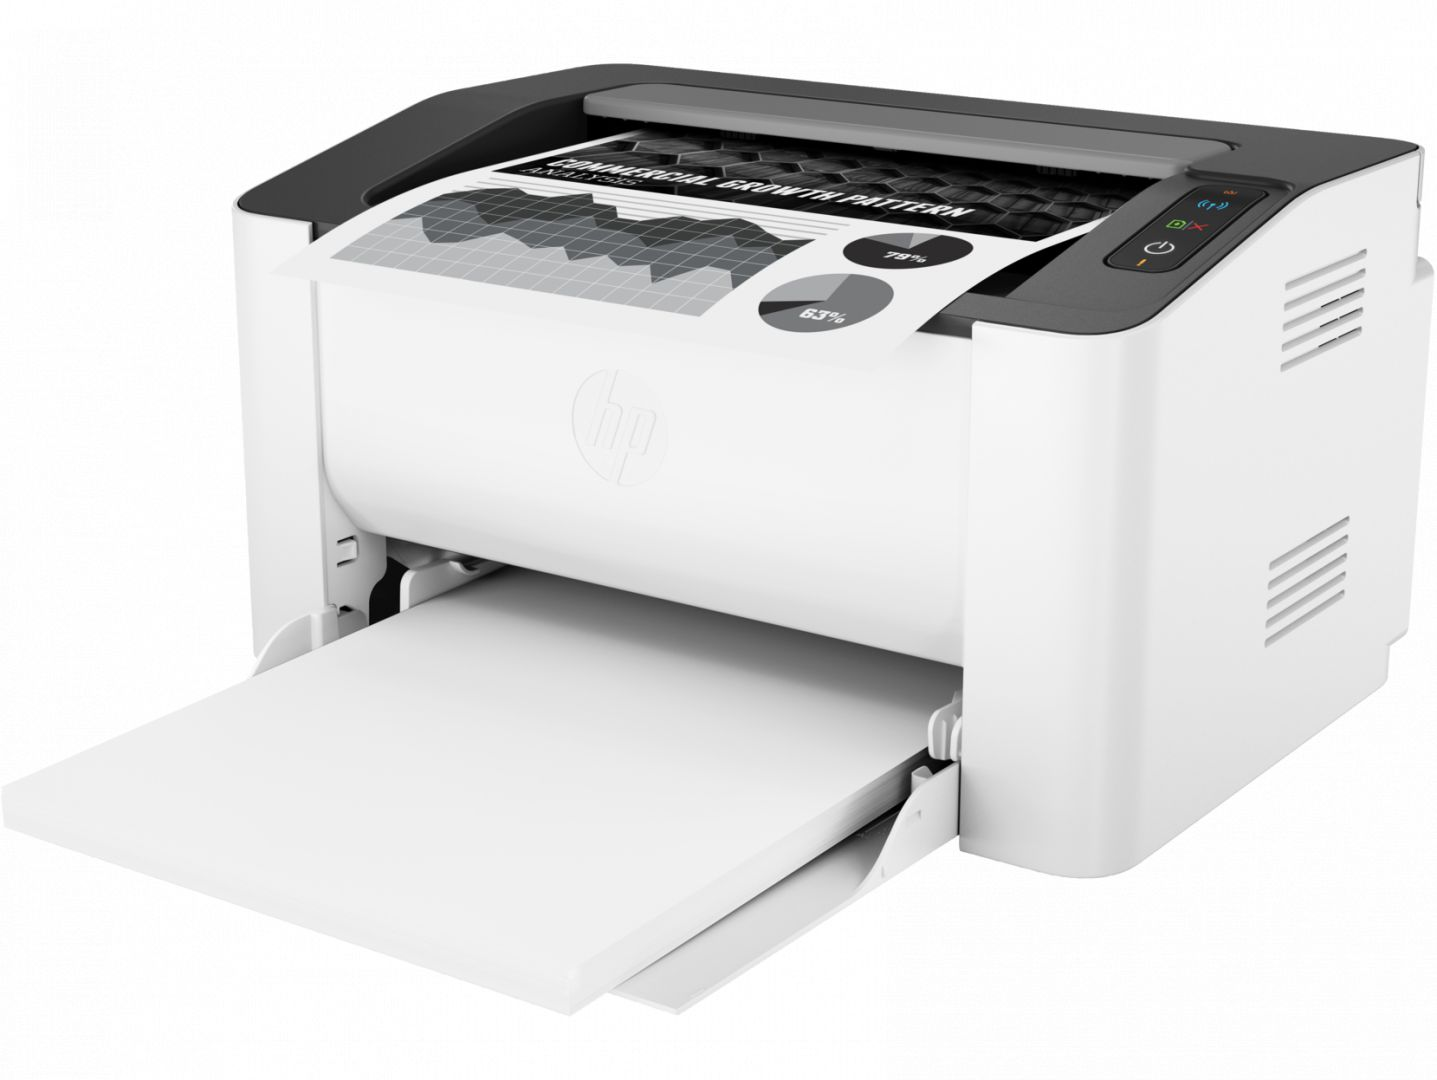 Nyomtató HP Laser 107w (4ZB78A) wireless lézernyomtató